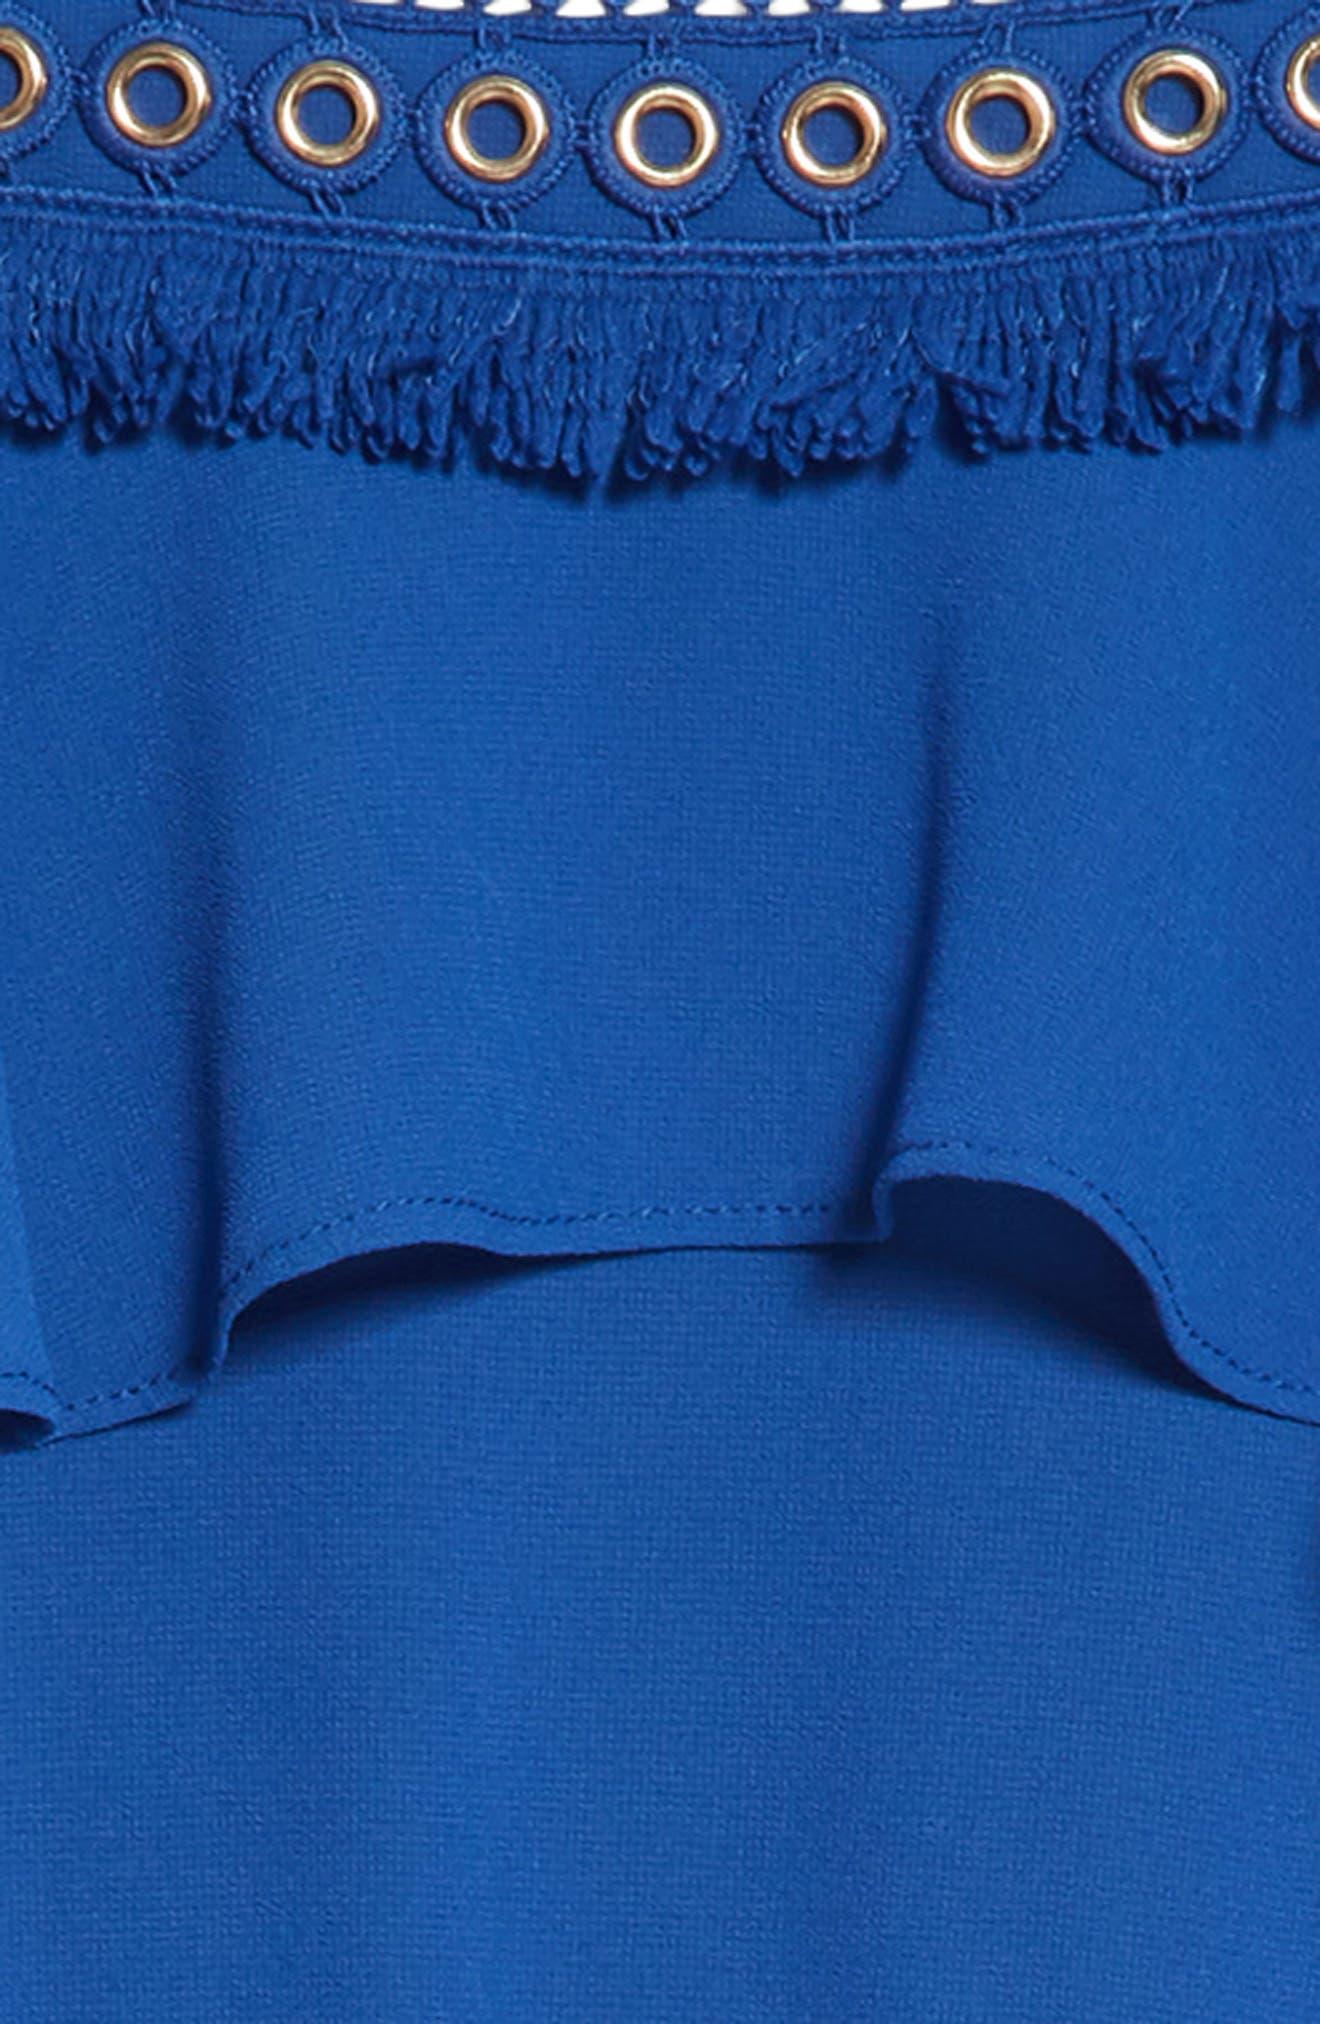 Ruffle Cold Shoulder Dress,                             Alternate thumbnail 3, color,                             481